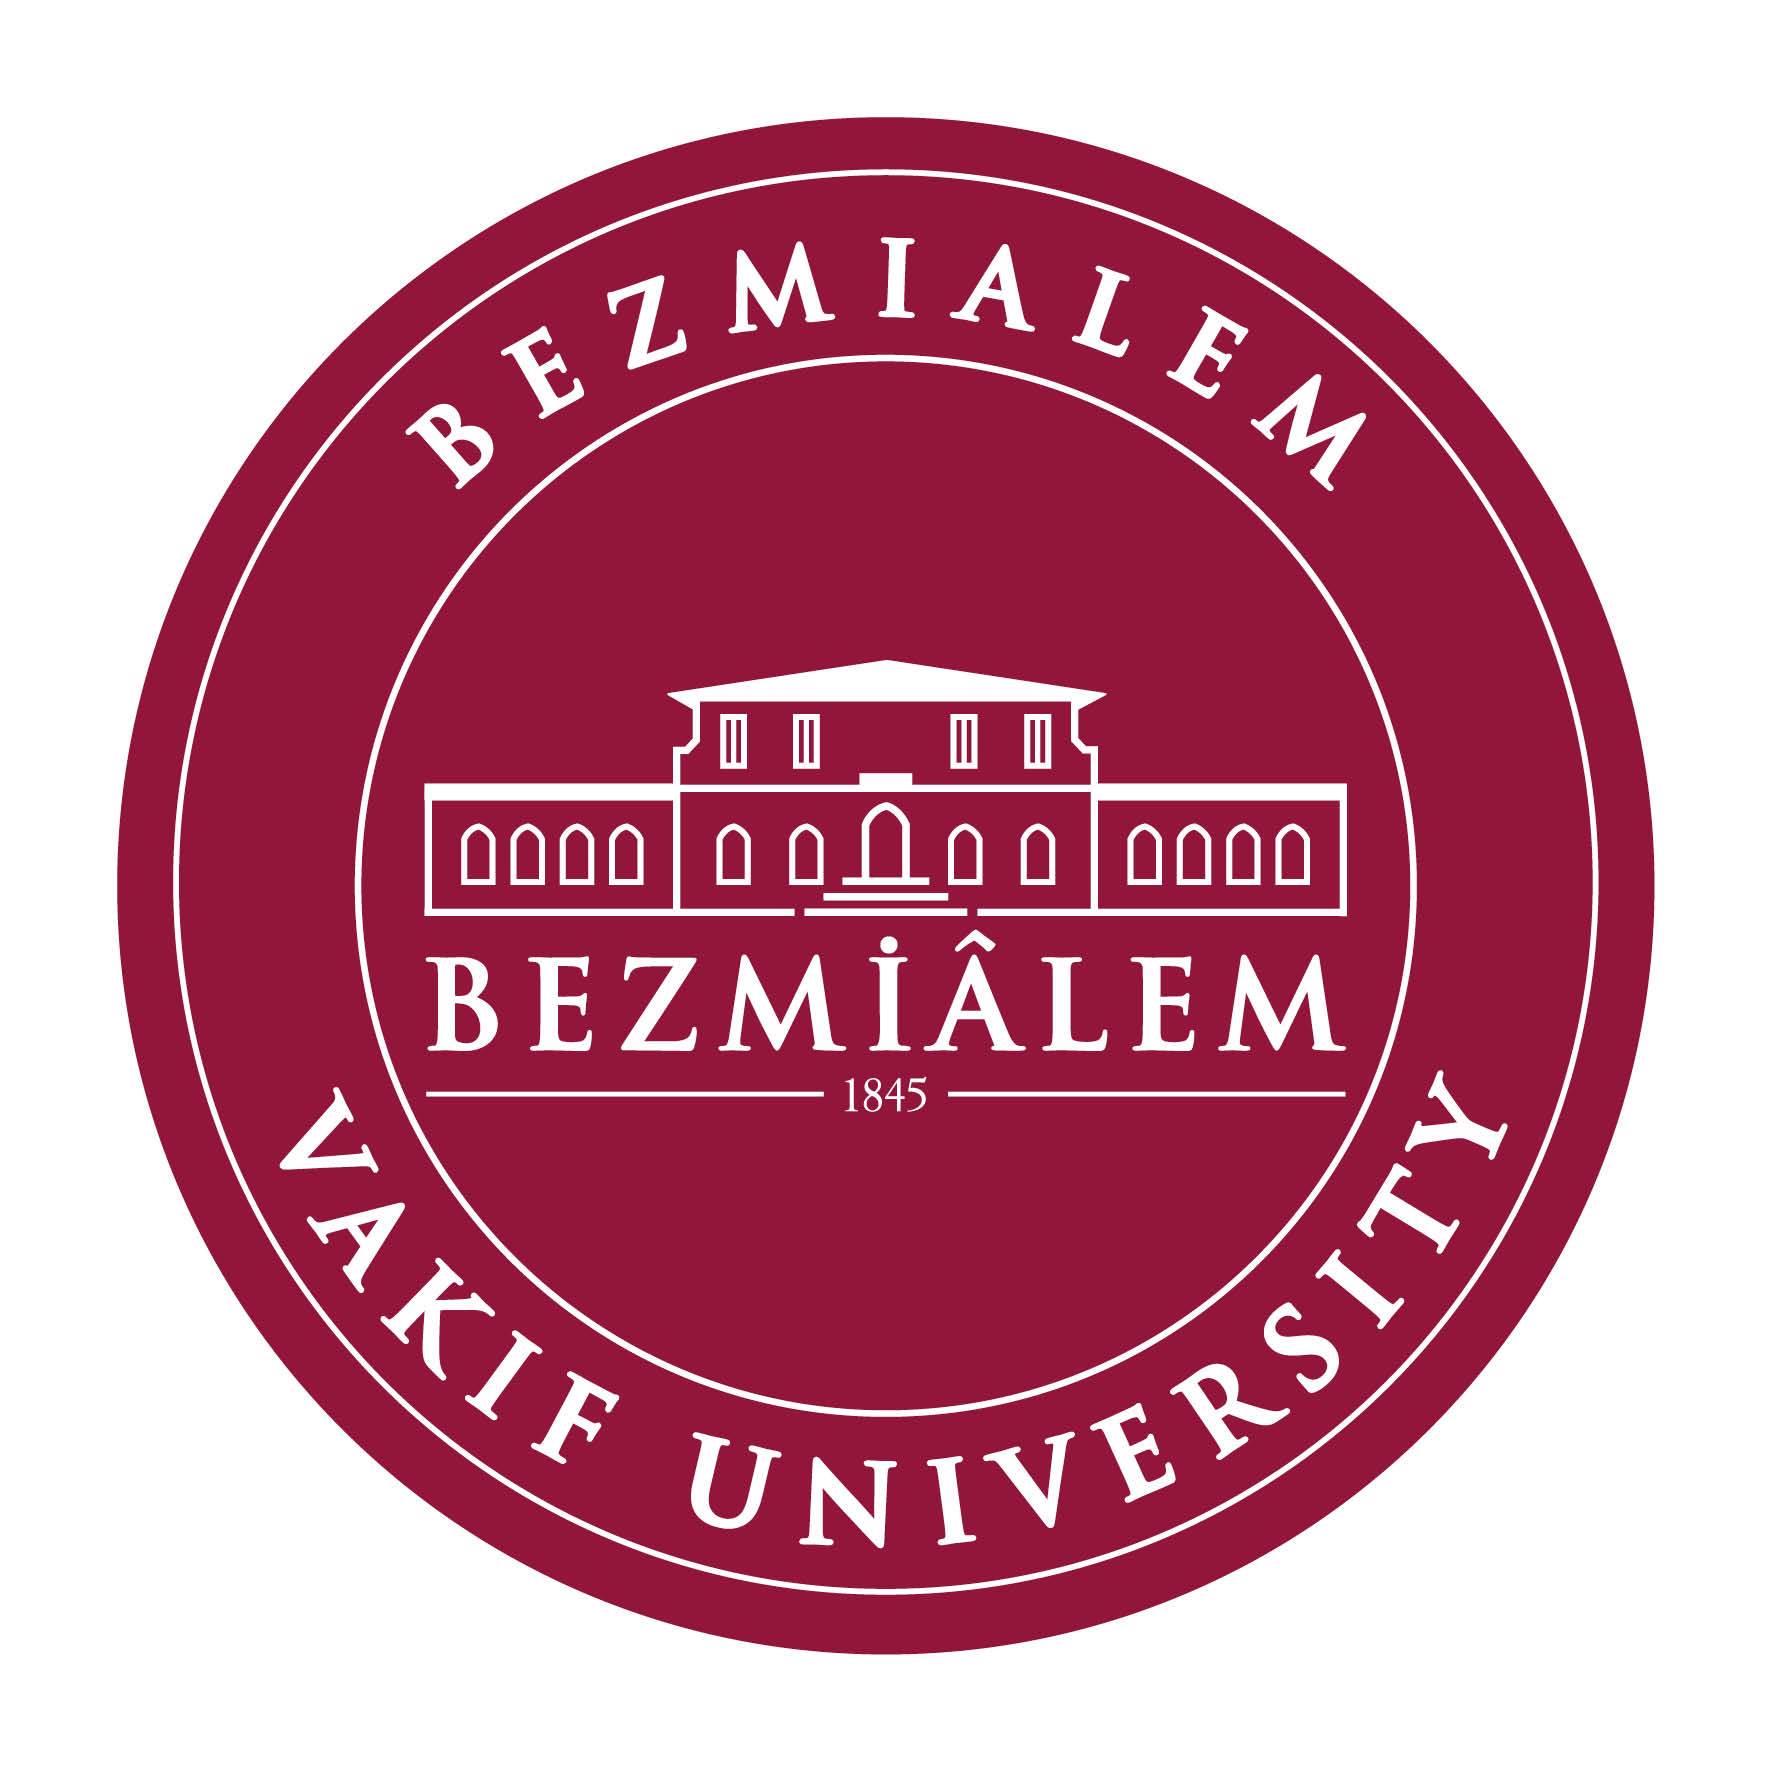 BEZMI ALEM FOUNDATION UNIVERSITY